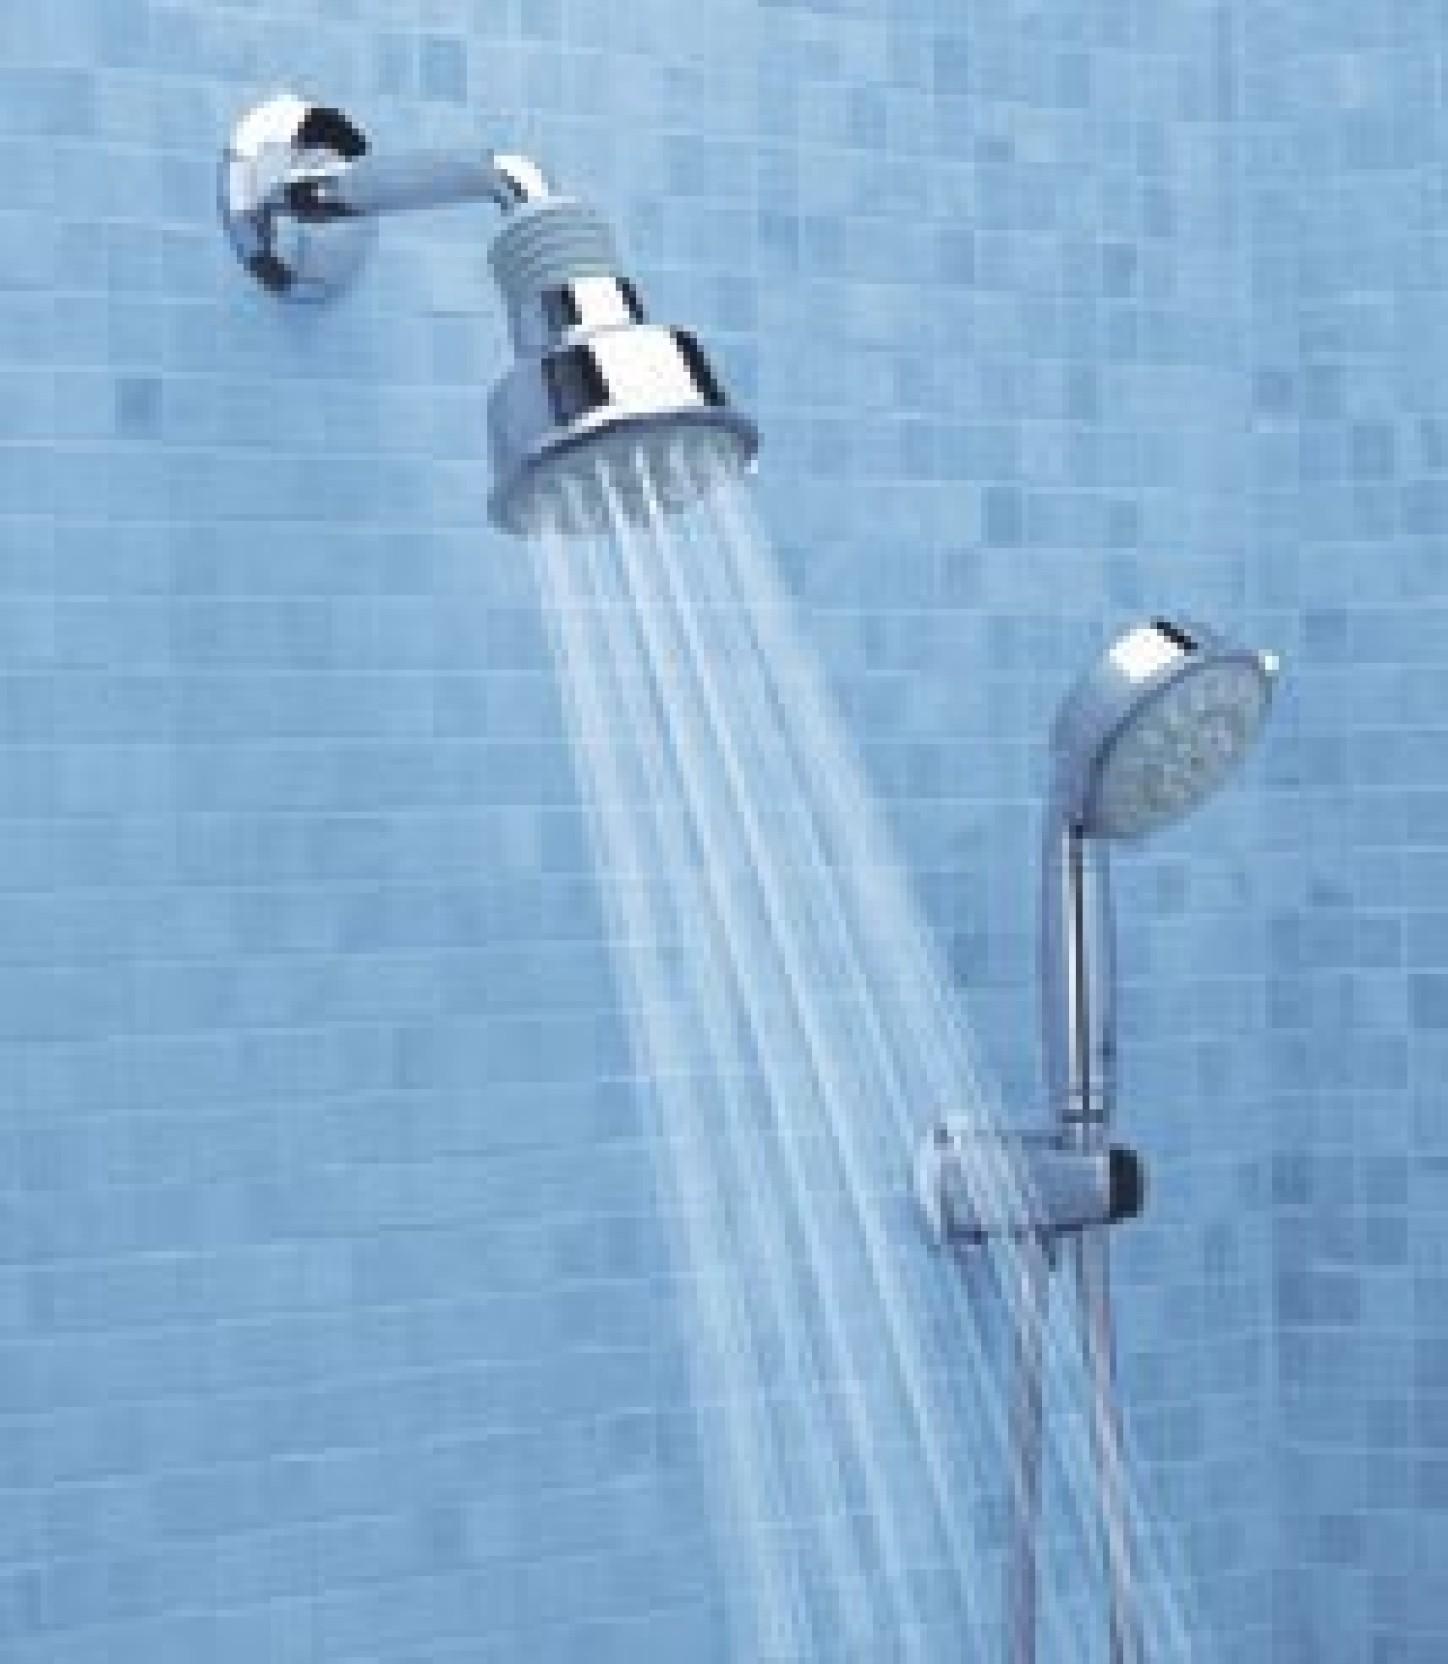 Grohe Relexa Rustic 100 Five headshower Shower Head Price in India ...